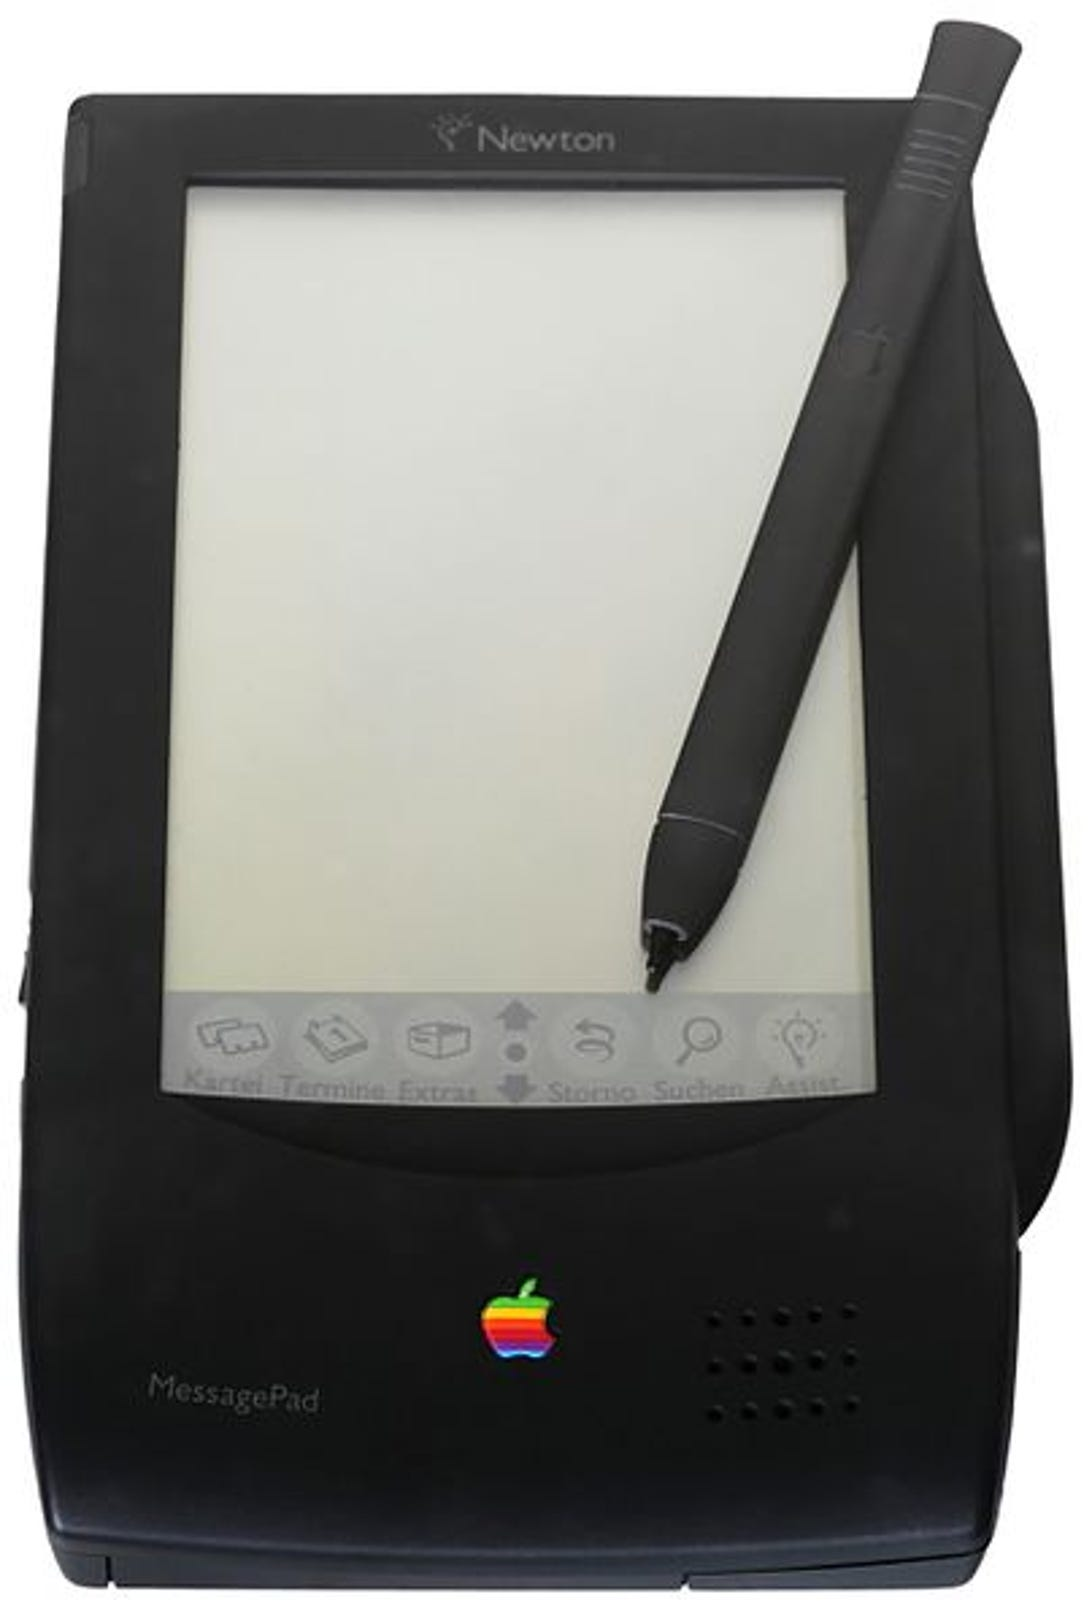 02-apple-newton-messagepad.jpg